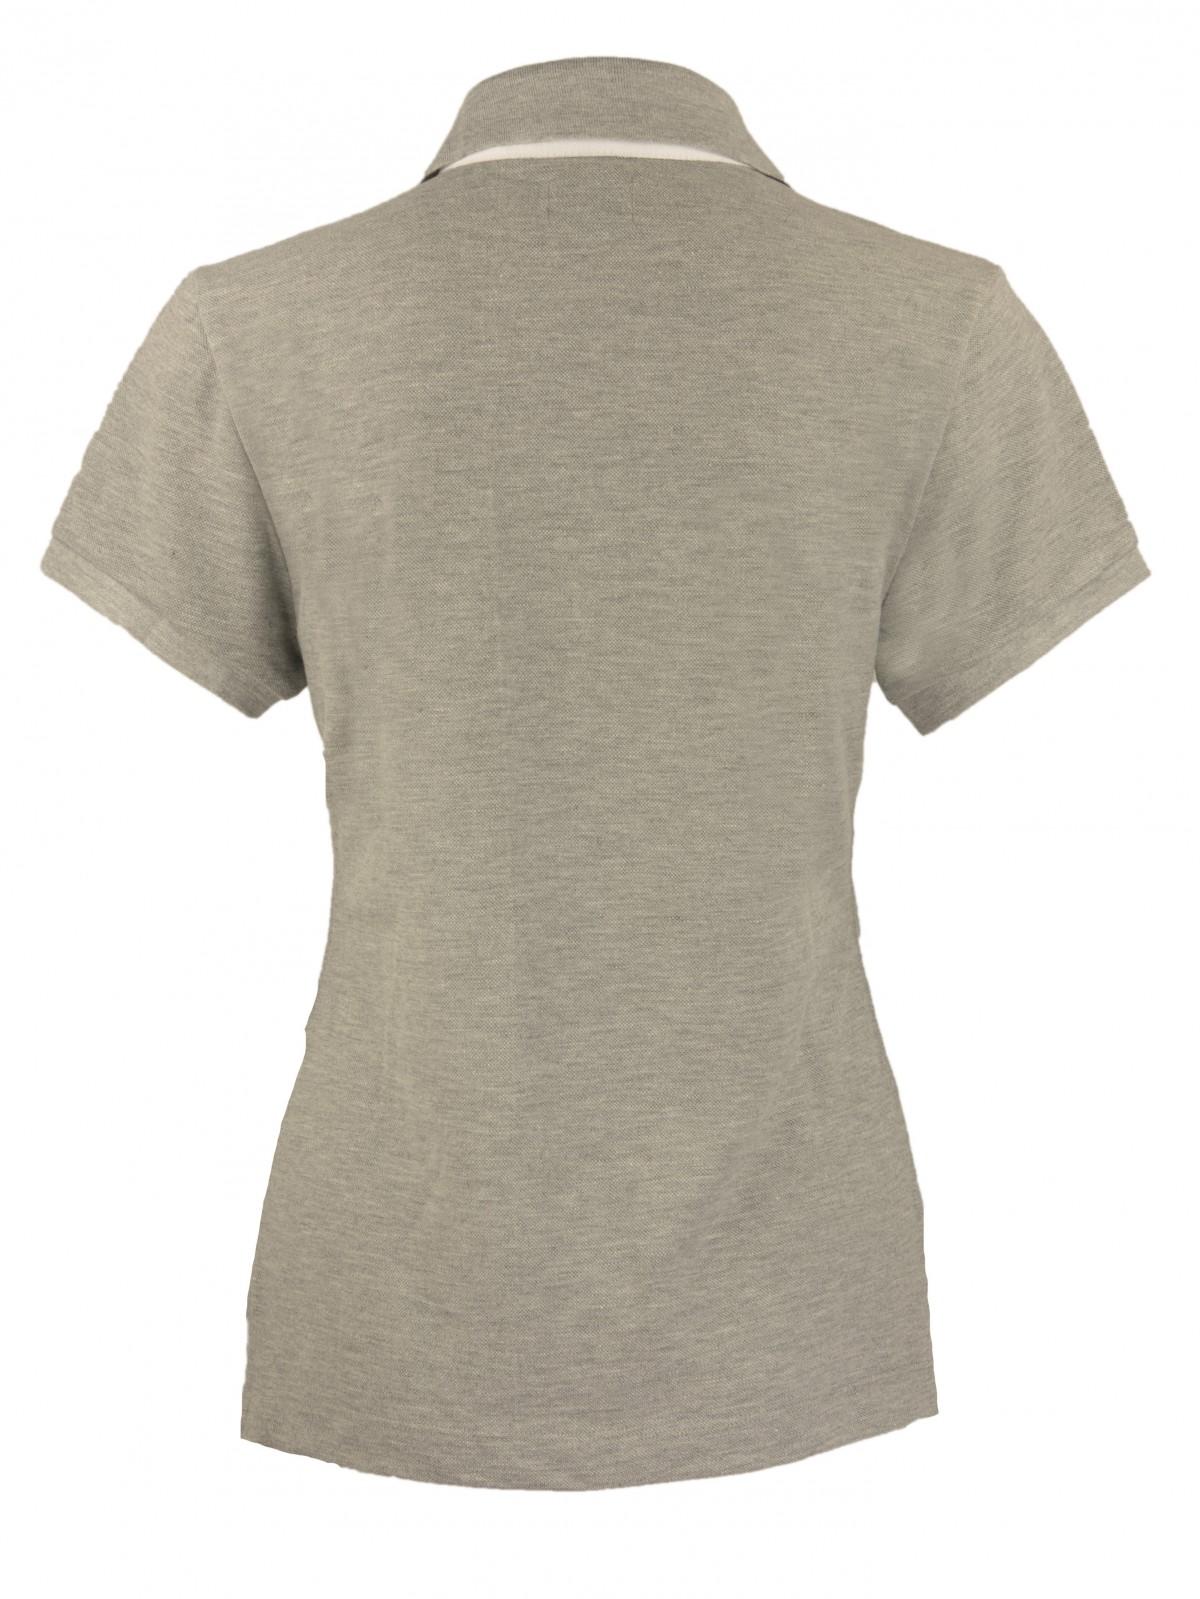 Classy Love Poloshirt in Grey Melange